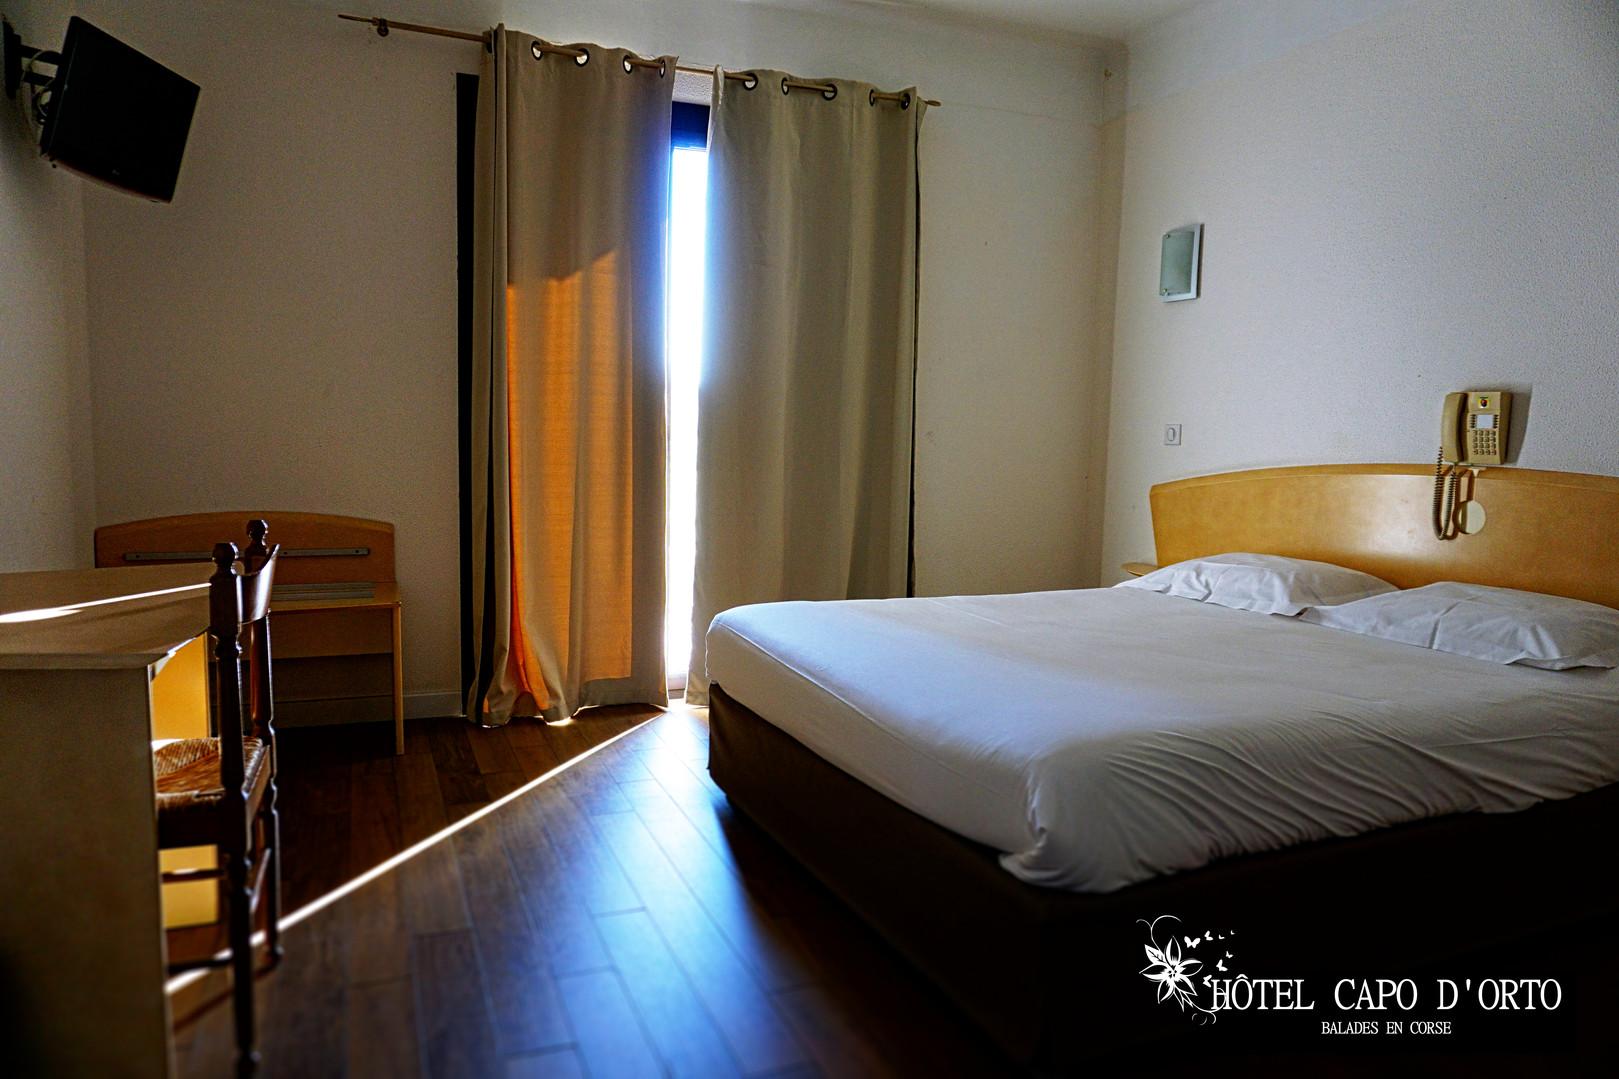 Hôtel Capo d'Orto | Porto